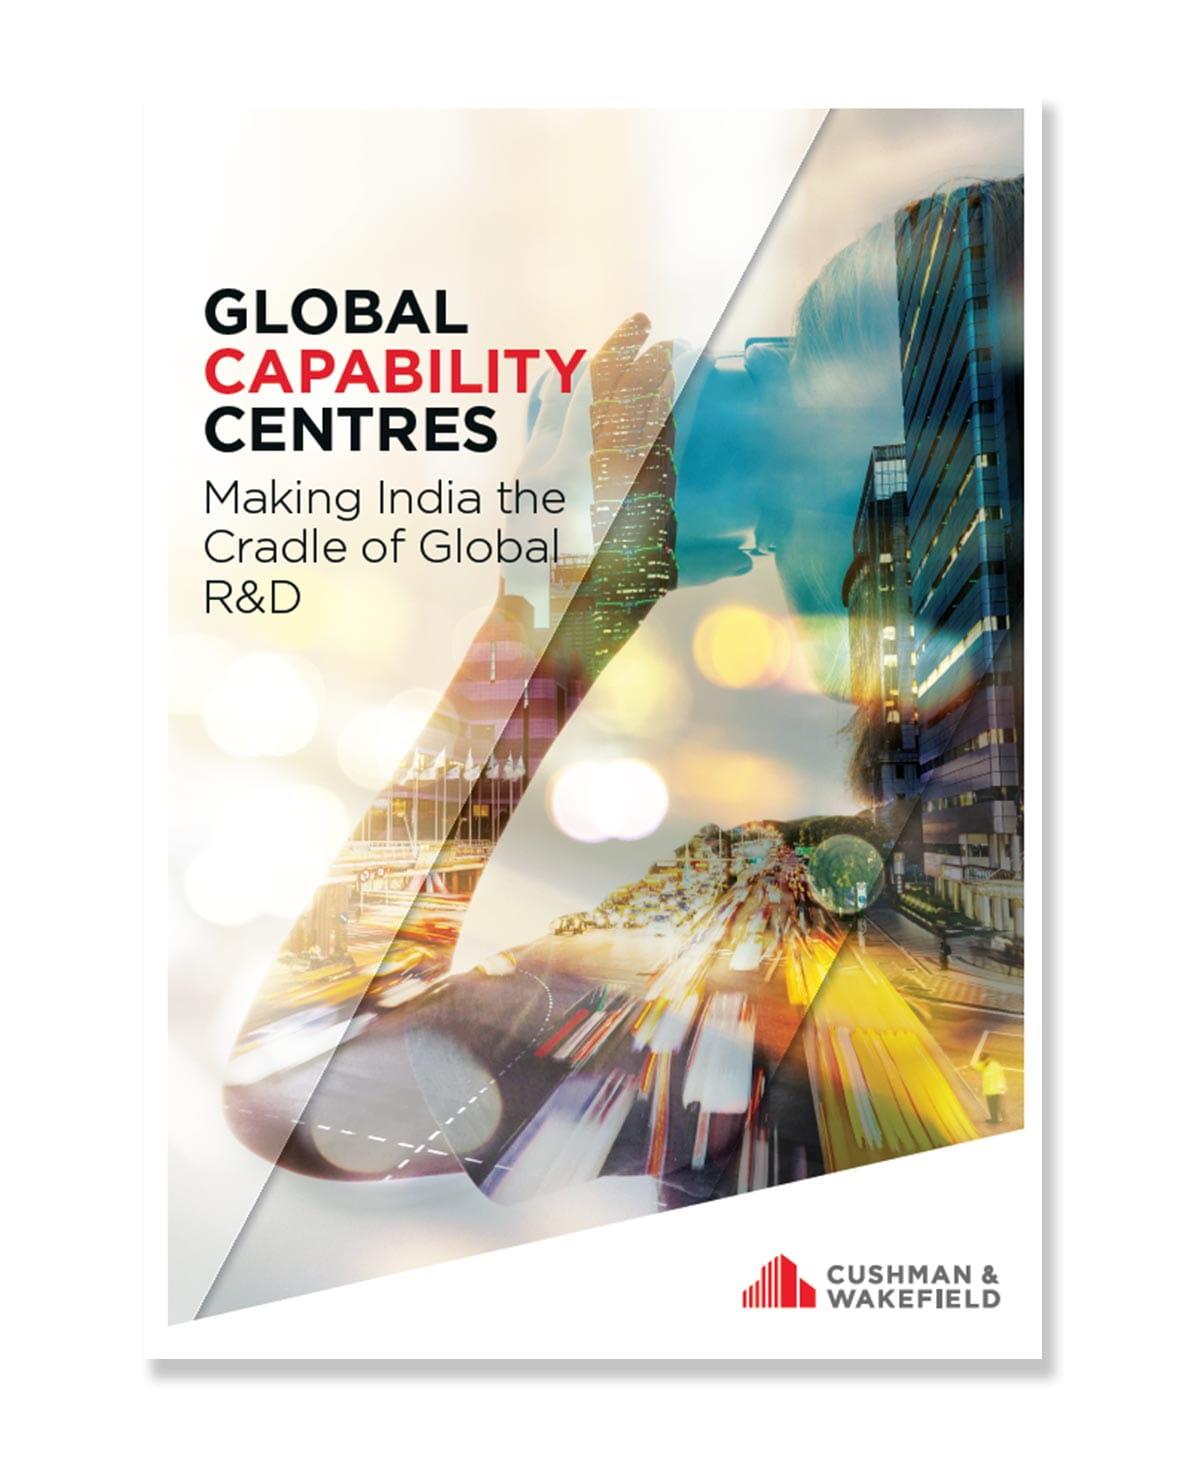 GLOBAL CAPABILITY CENTRES